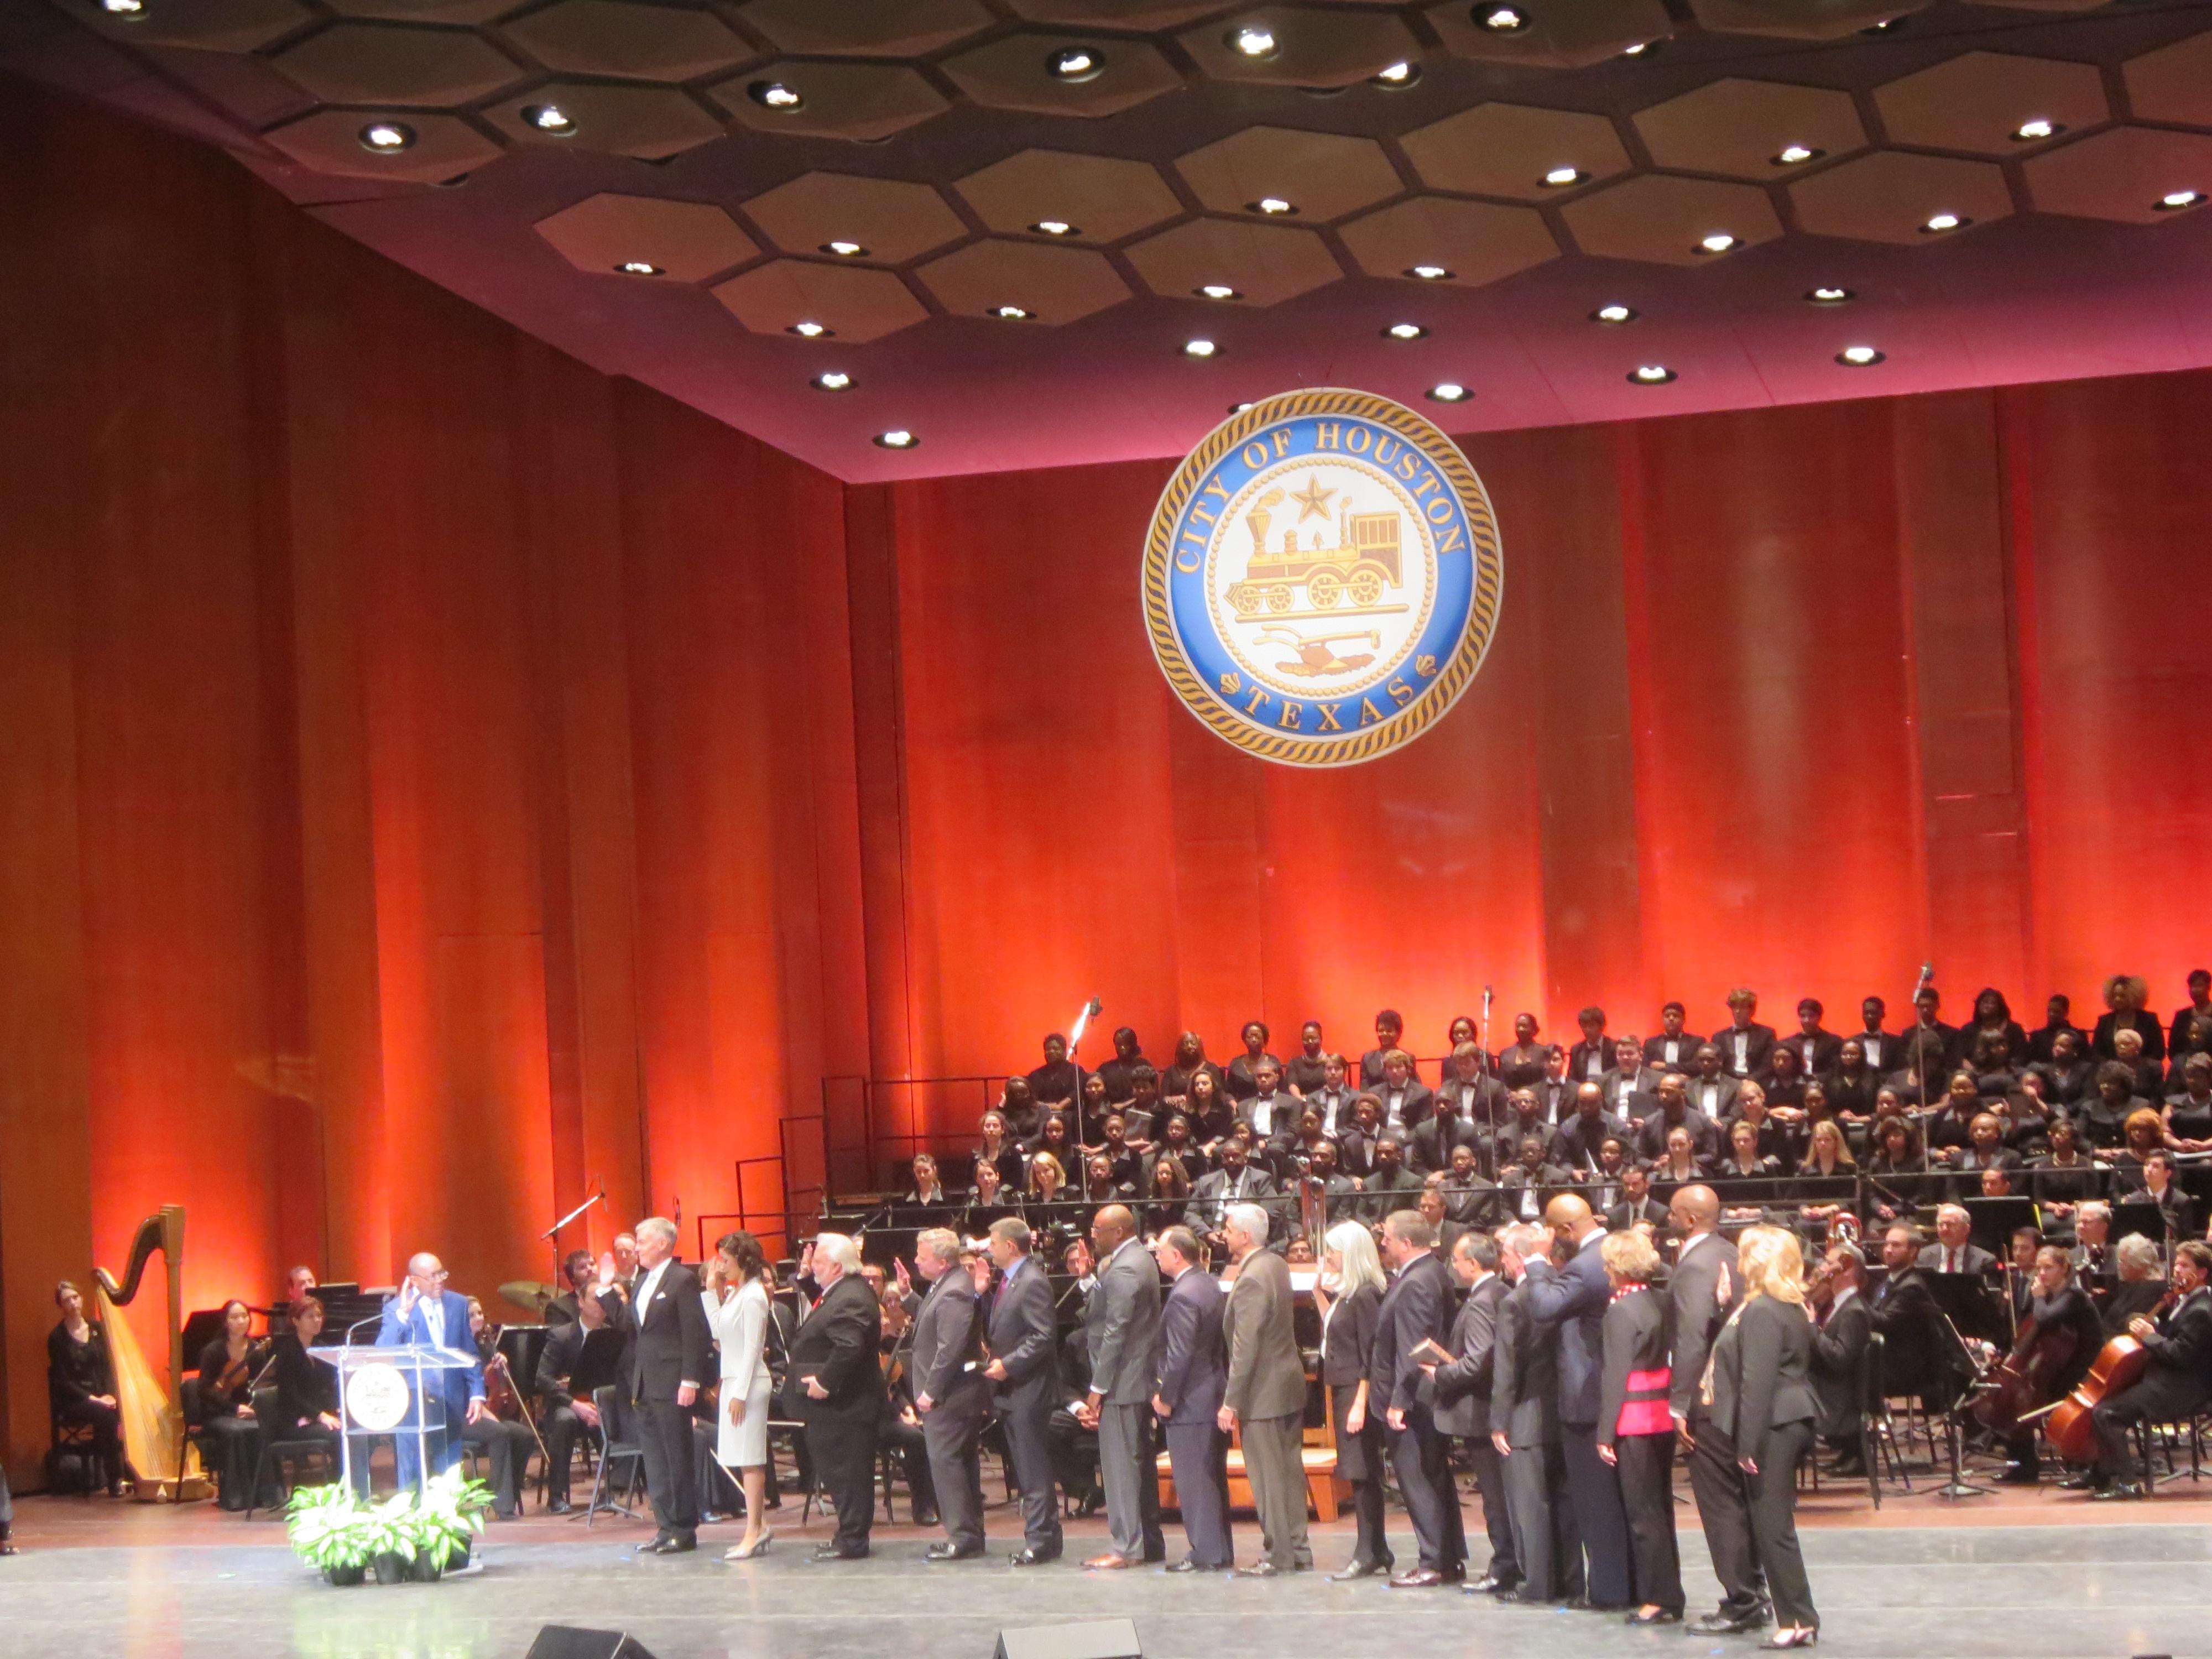 2016 Houston Mayoral Inauguration